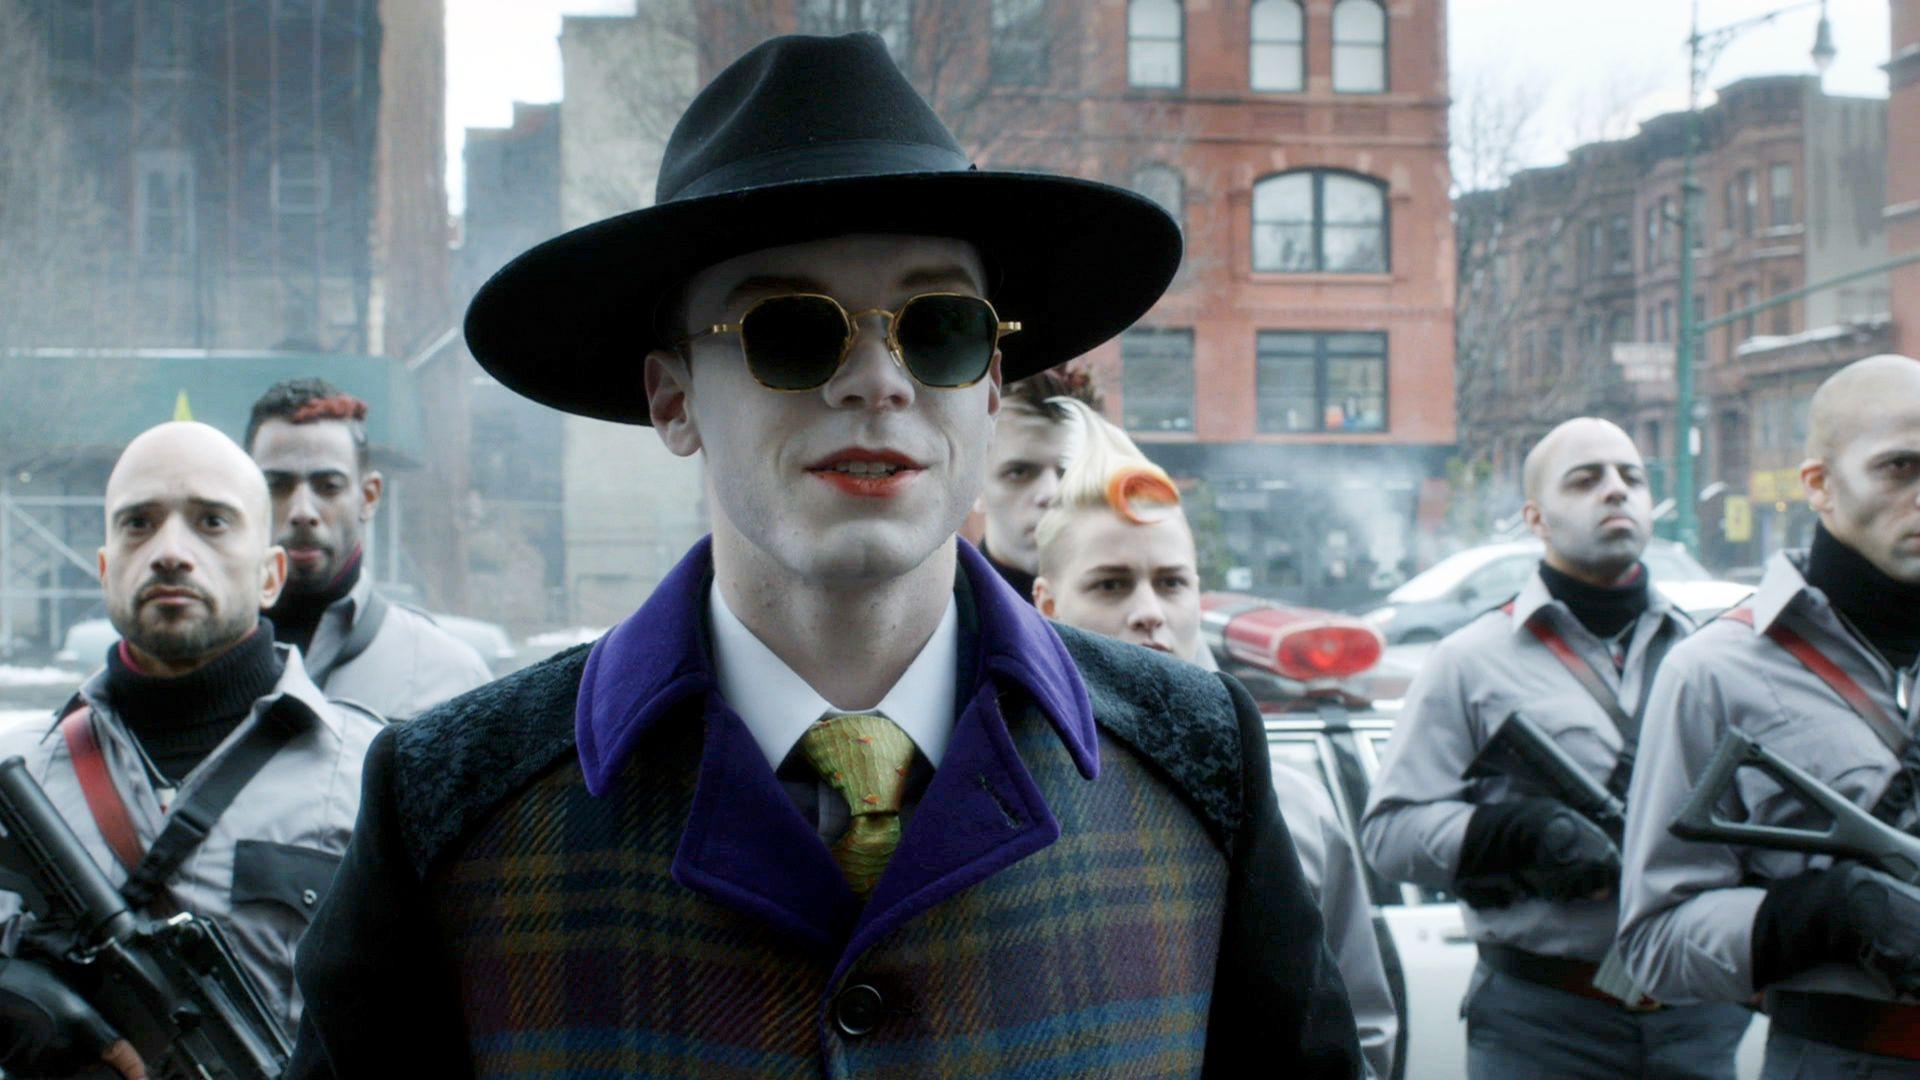 Gotham — s04e21 — A Dark Knight: One Bad Day